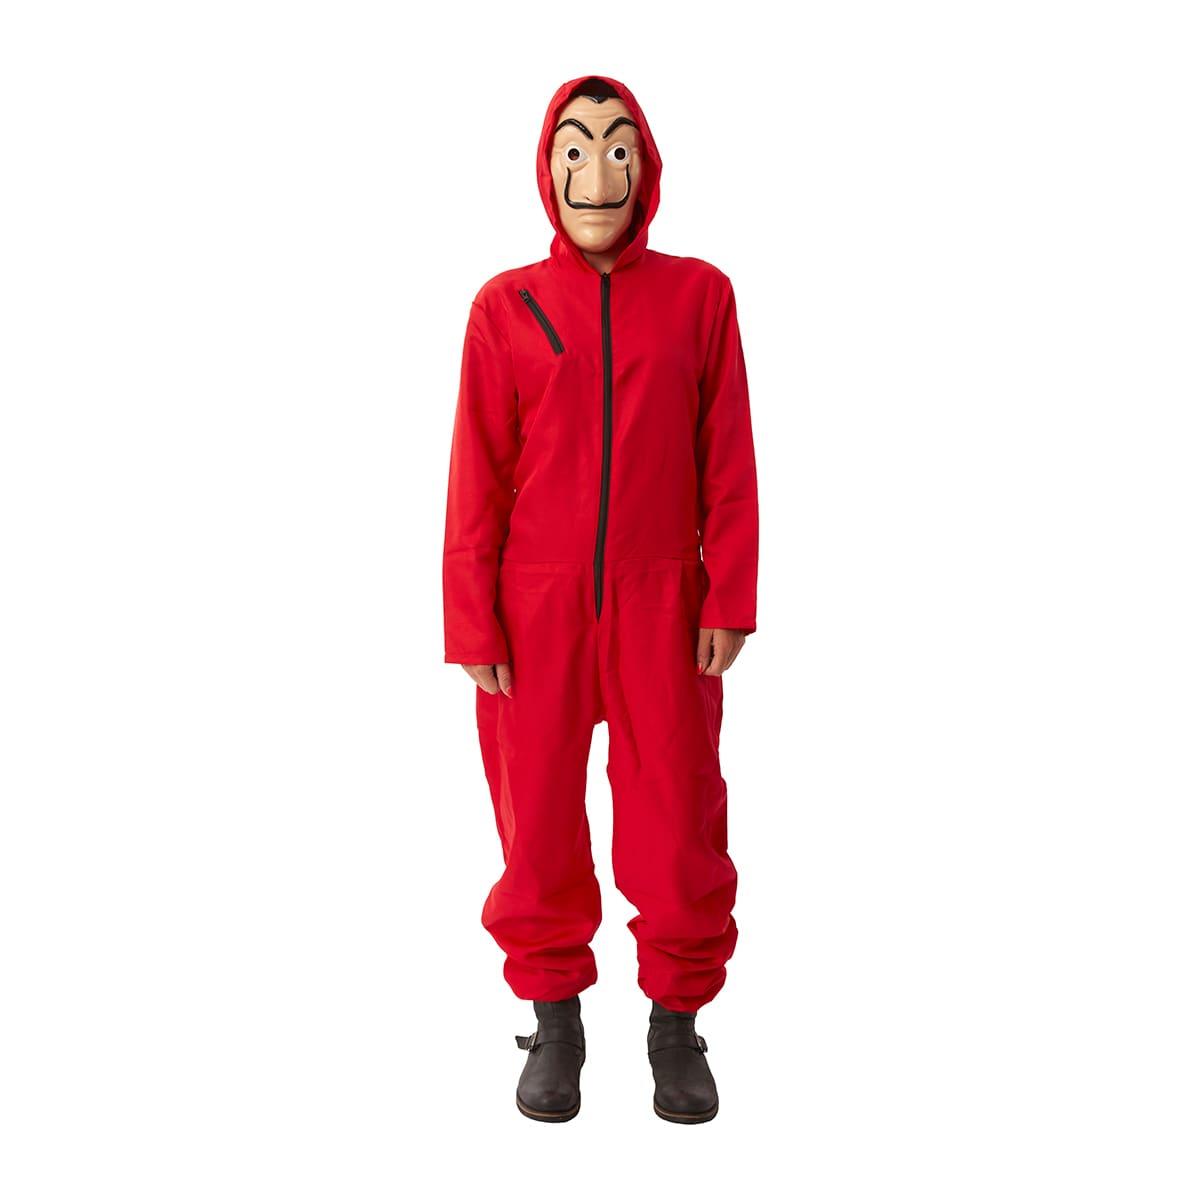 Rode overall kostuum